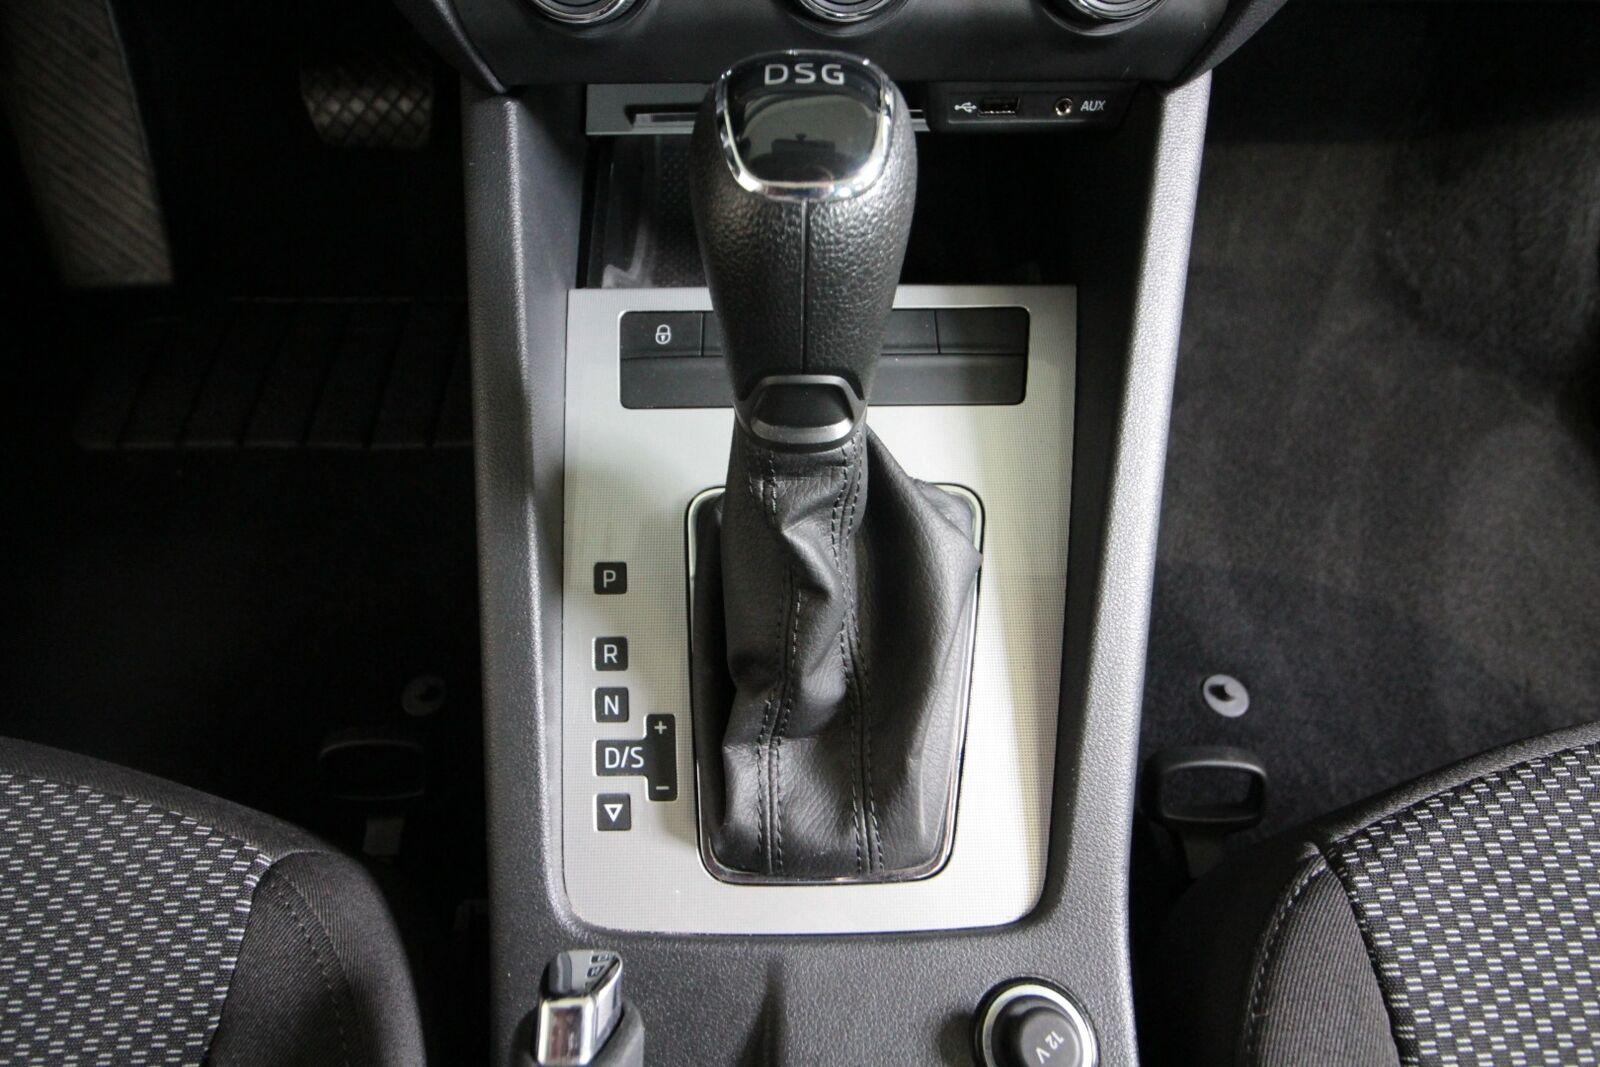 Skoda Octavia TDi 110 Ambition Combi DSG